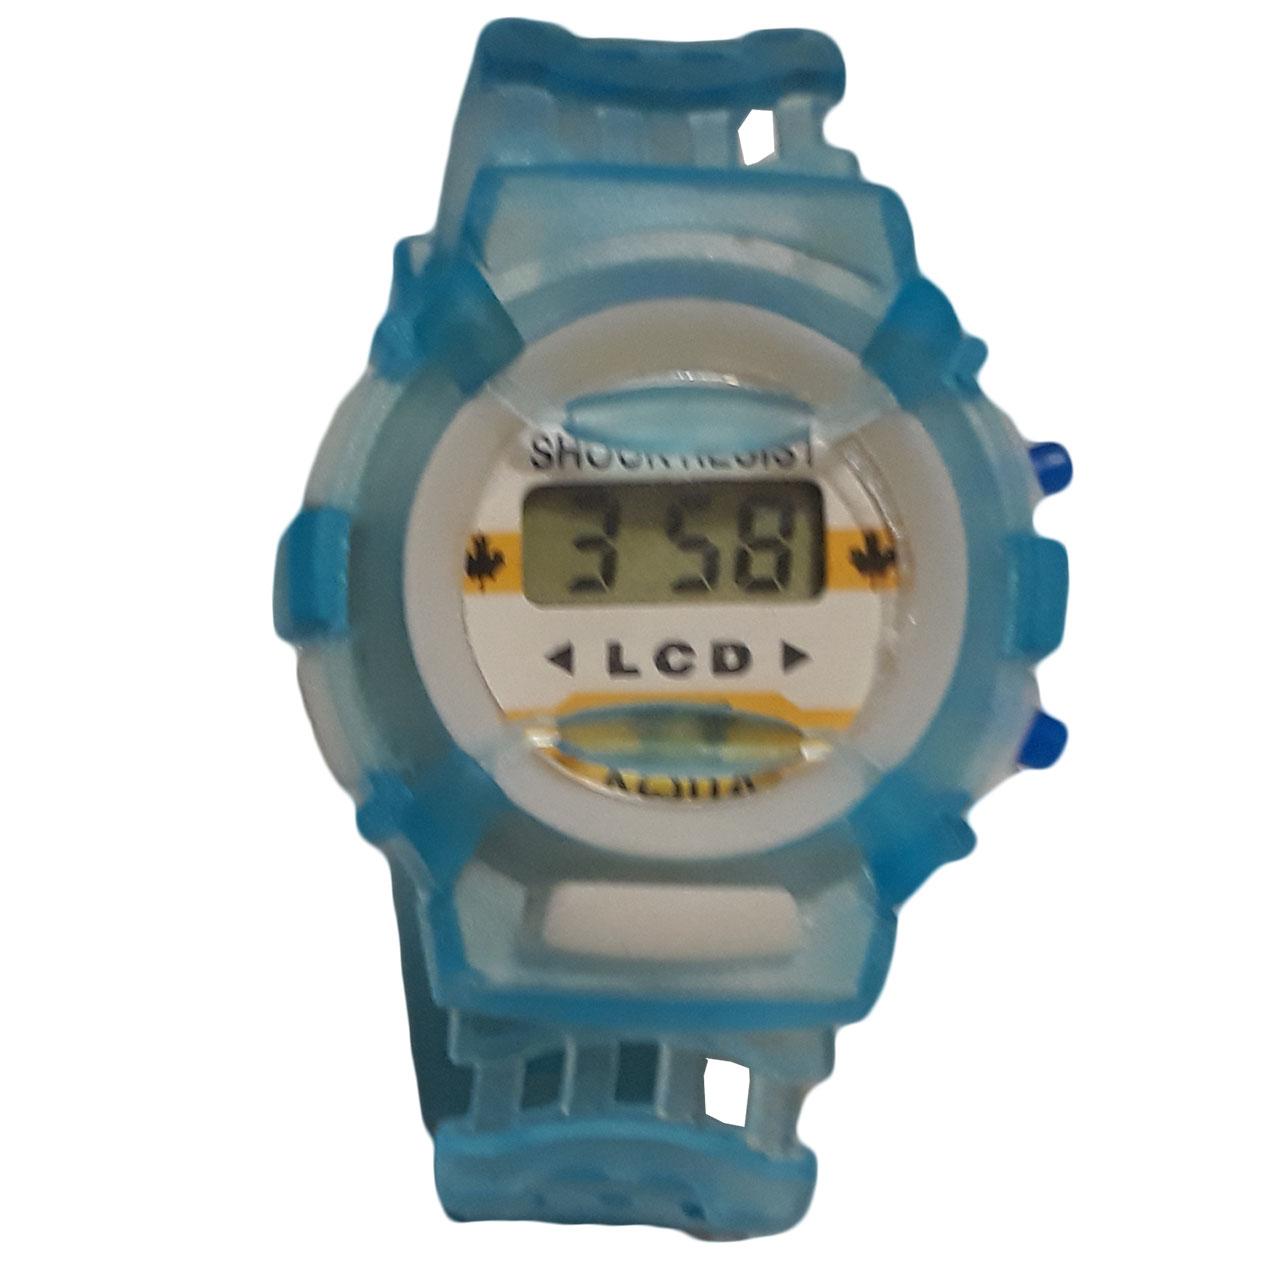 ساعت مچی دیجیتالی بچگانه مدل Bl-Transparent